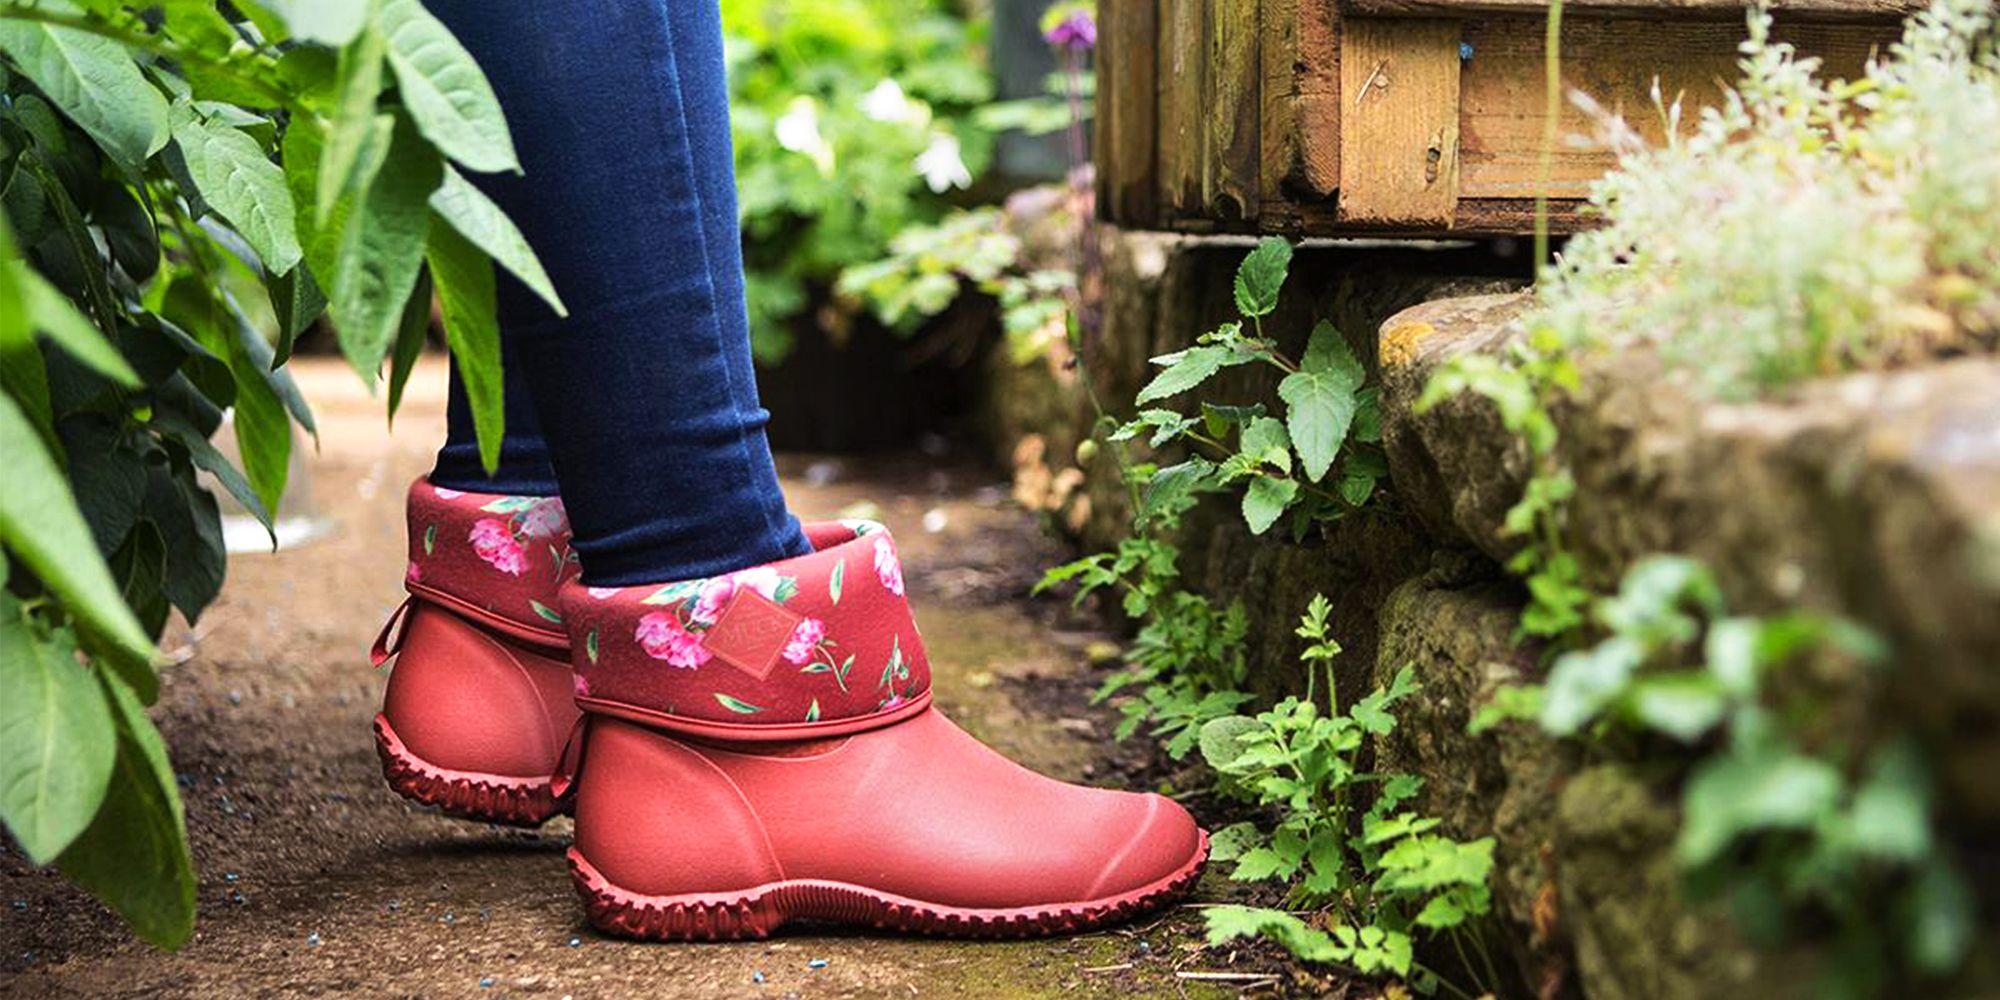 gardening shoes best 2019